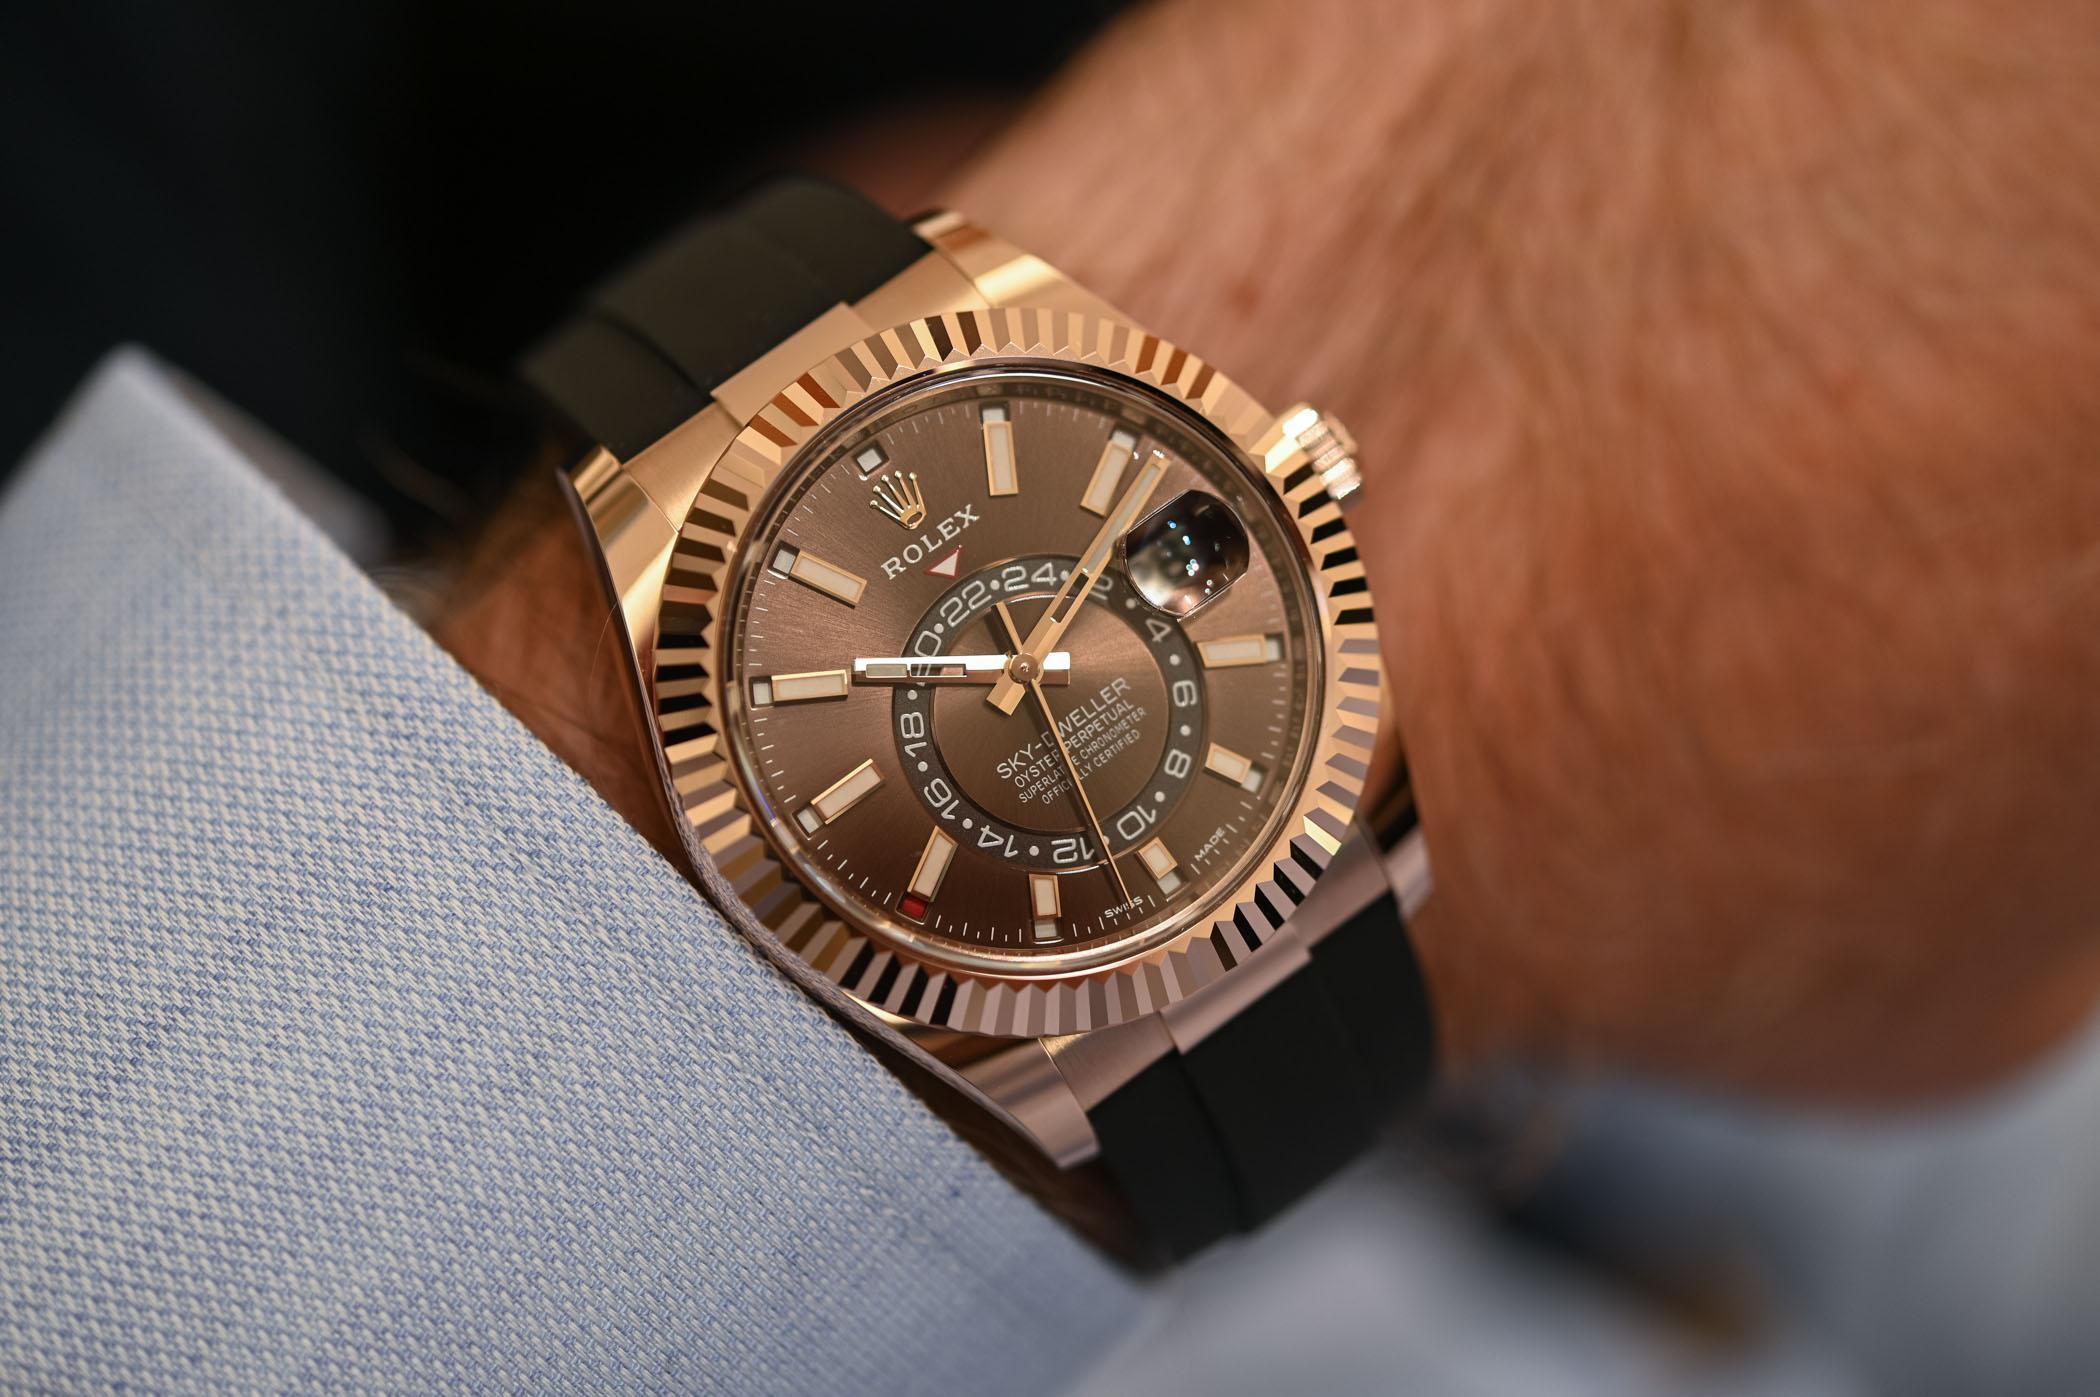 Rolex Sky-Dweller Oysterflex Bracelet Everose Gold Chocolate Dial 326235 - 2